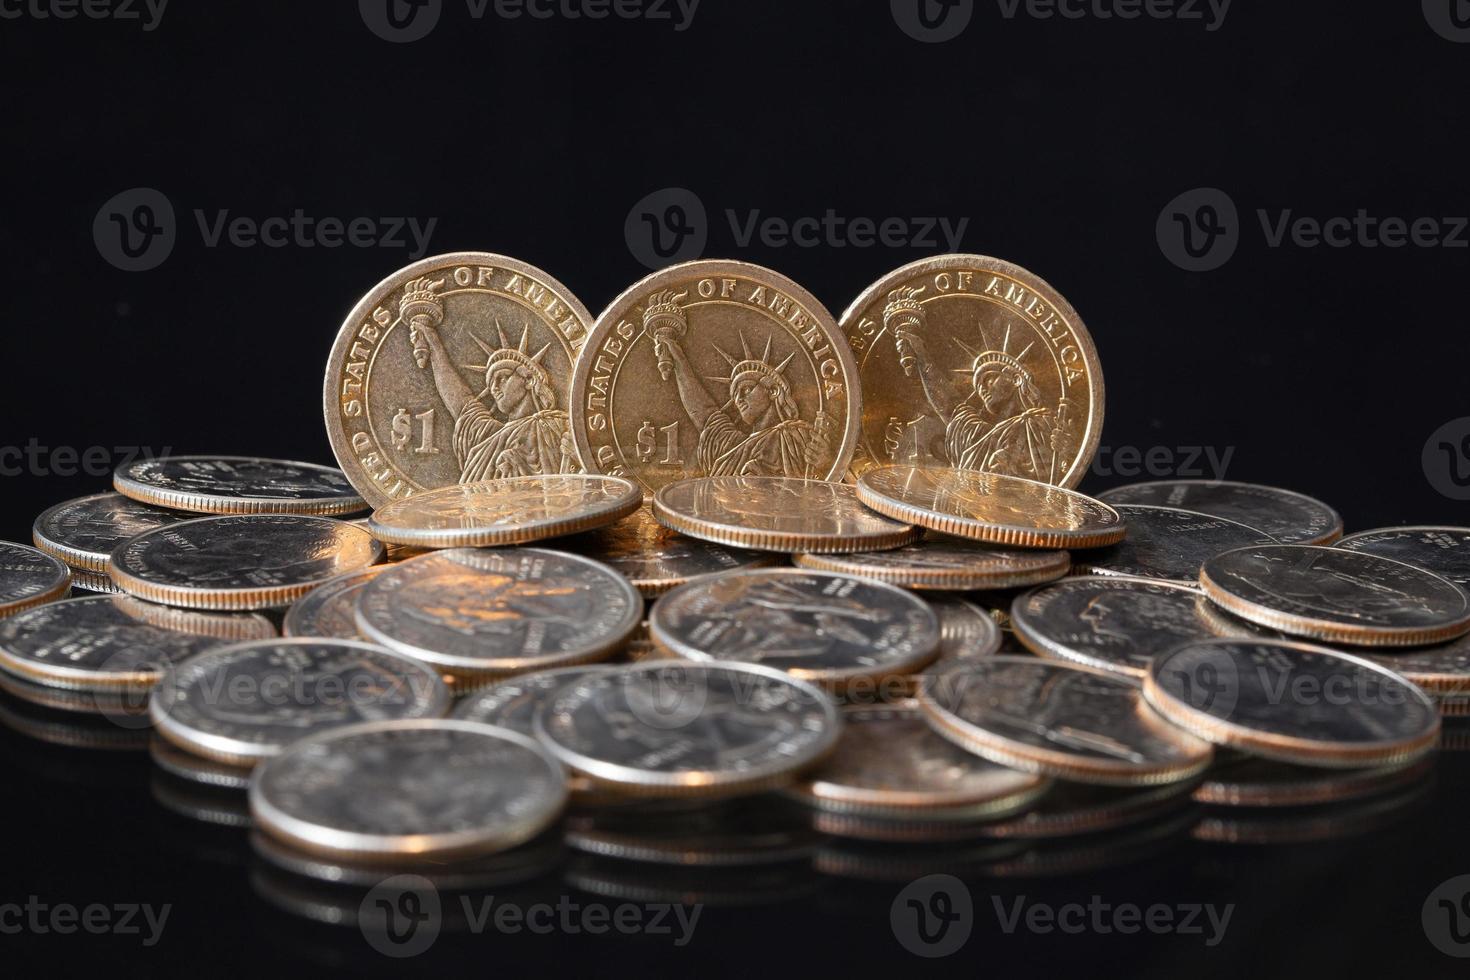 Amerikaanse dollar munten op een tafel foto